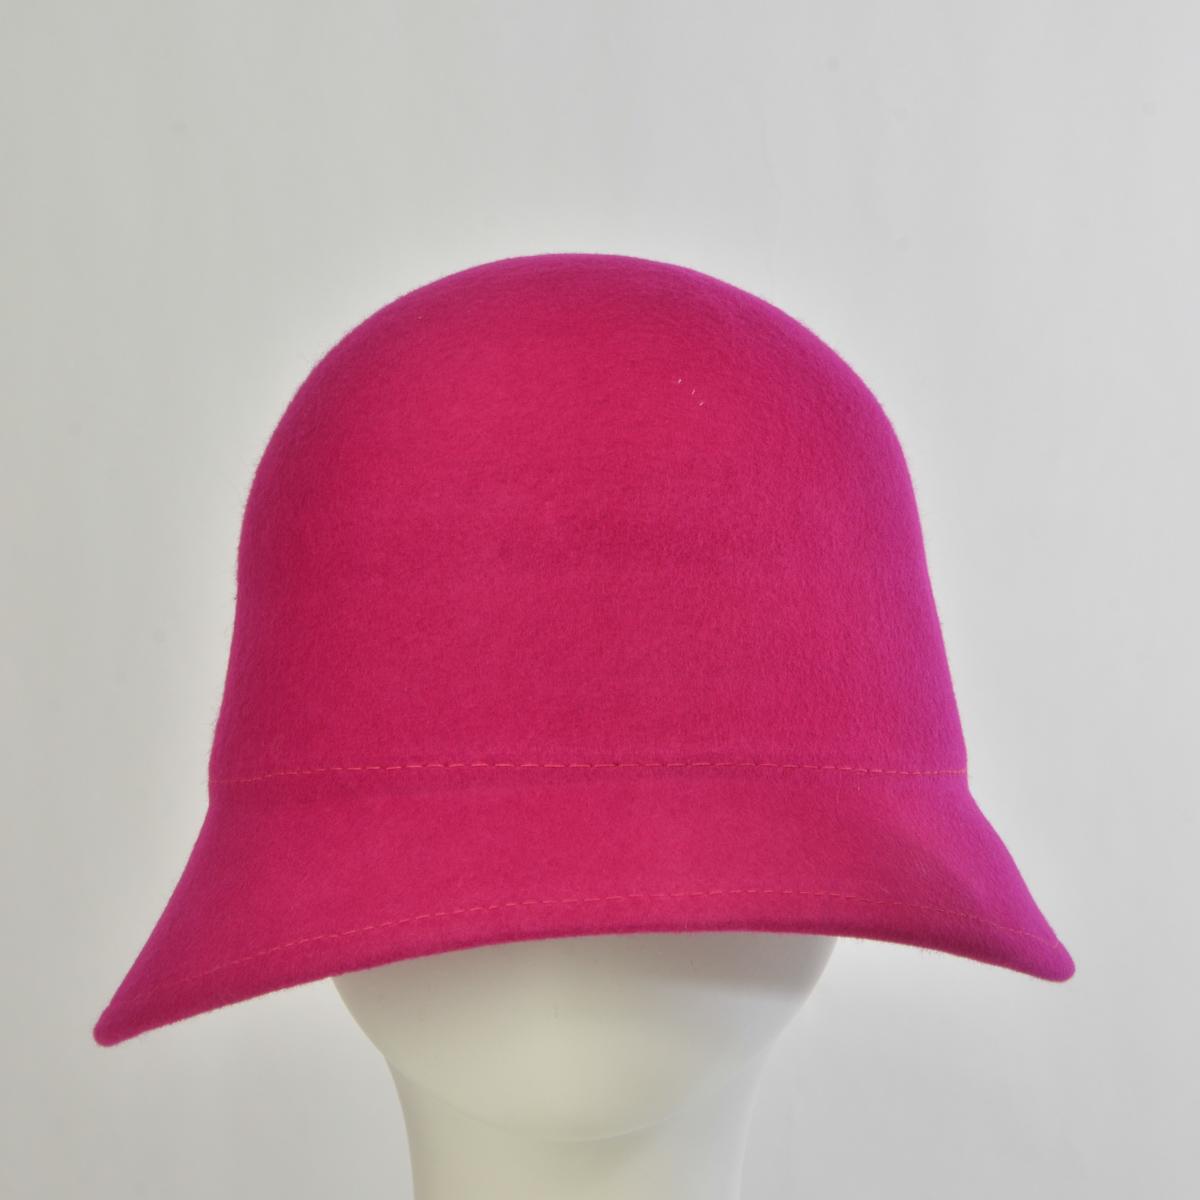 11eee55a54f Fuchsia Bell Shaped Cloche Felt Plain Hats-W7005-FUCHSIA- Sun Yorkos ...